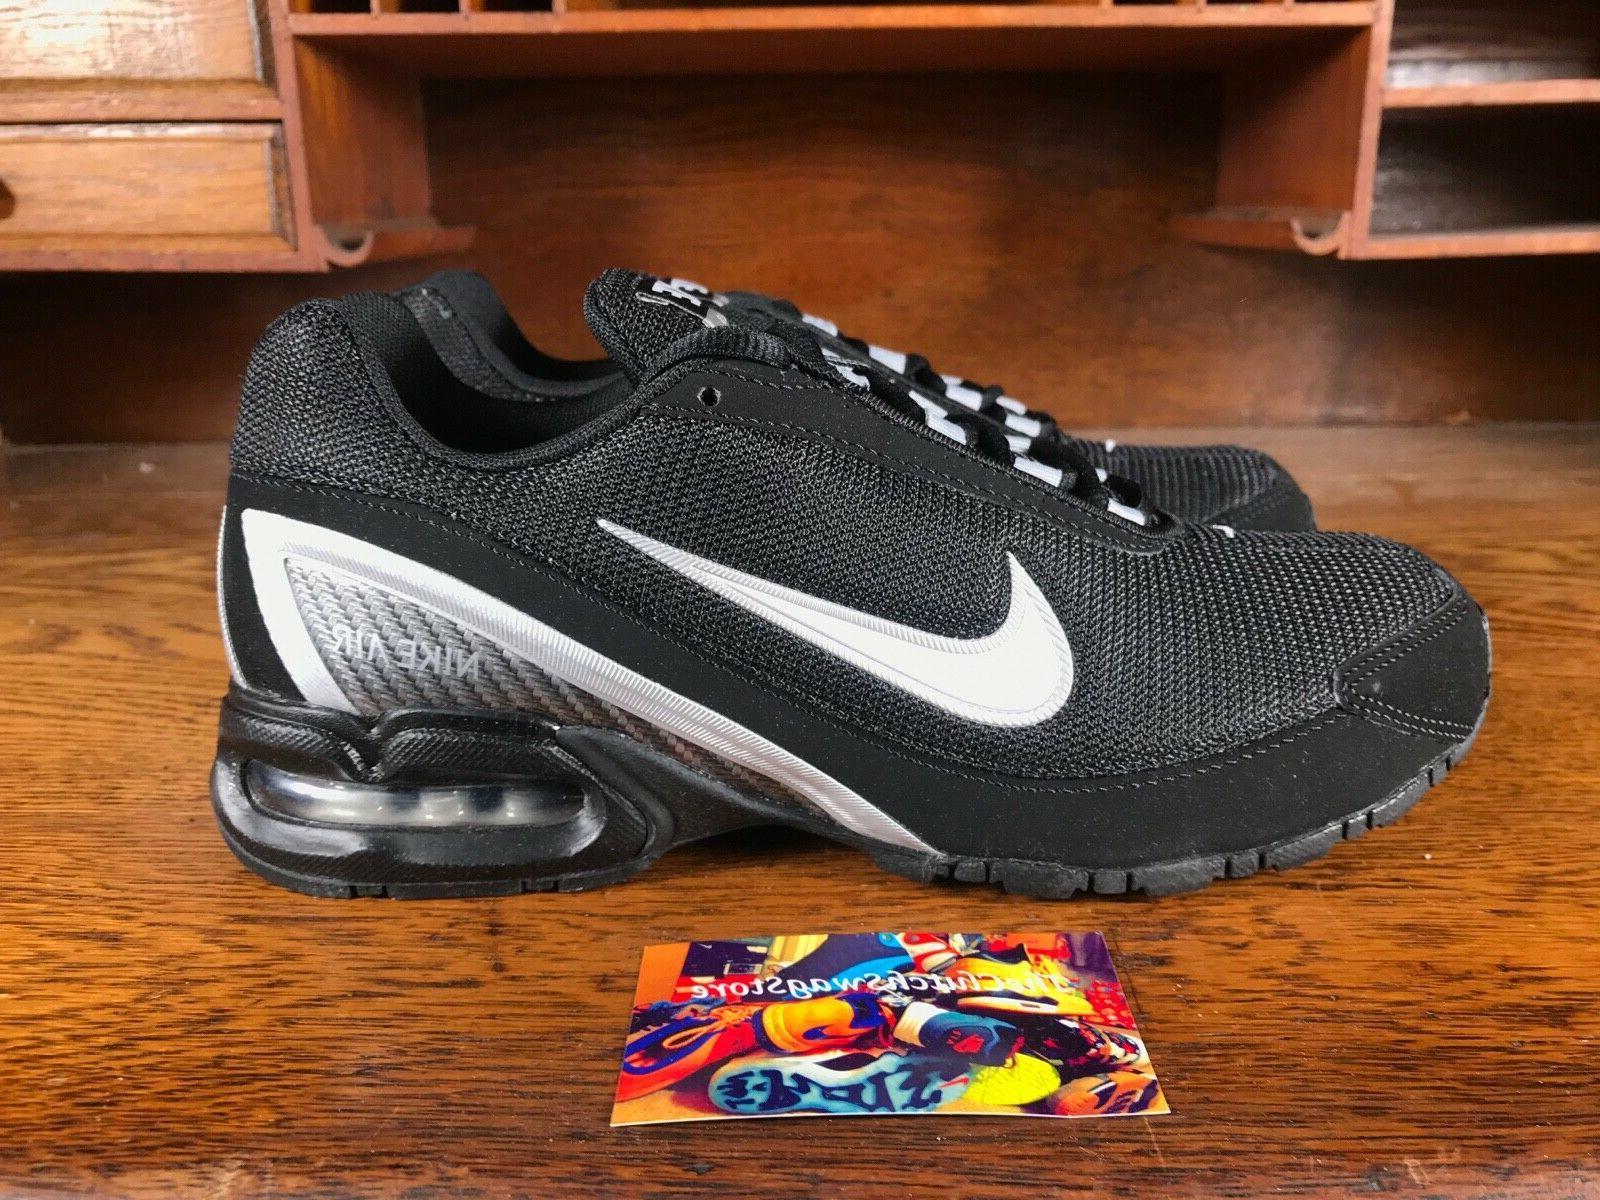 Nike Air 3 Black/White 319116-011 All Sizes